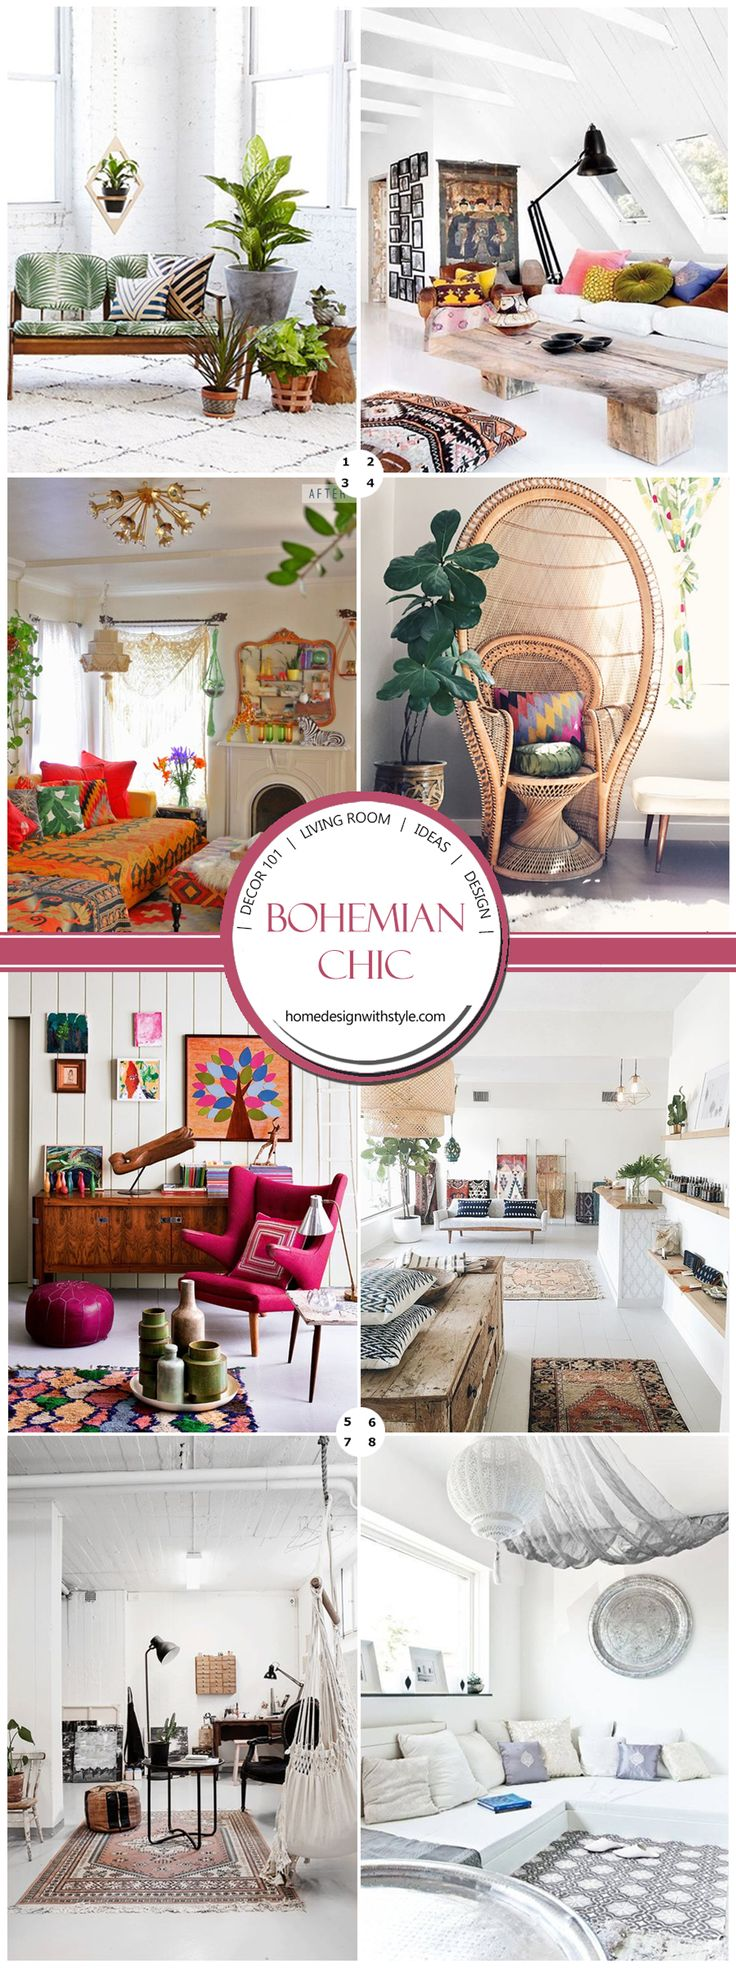 Bohemian Living Room Decor (boho chic decor), (boho chic hippie decor), (bohemian decor), (modern bohemian living room decor), (bohemian living room ideas)